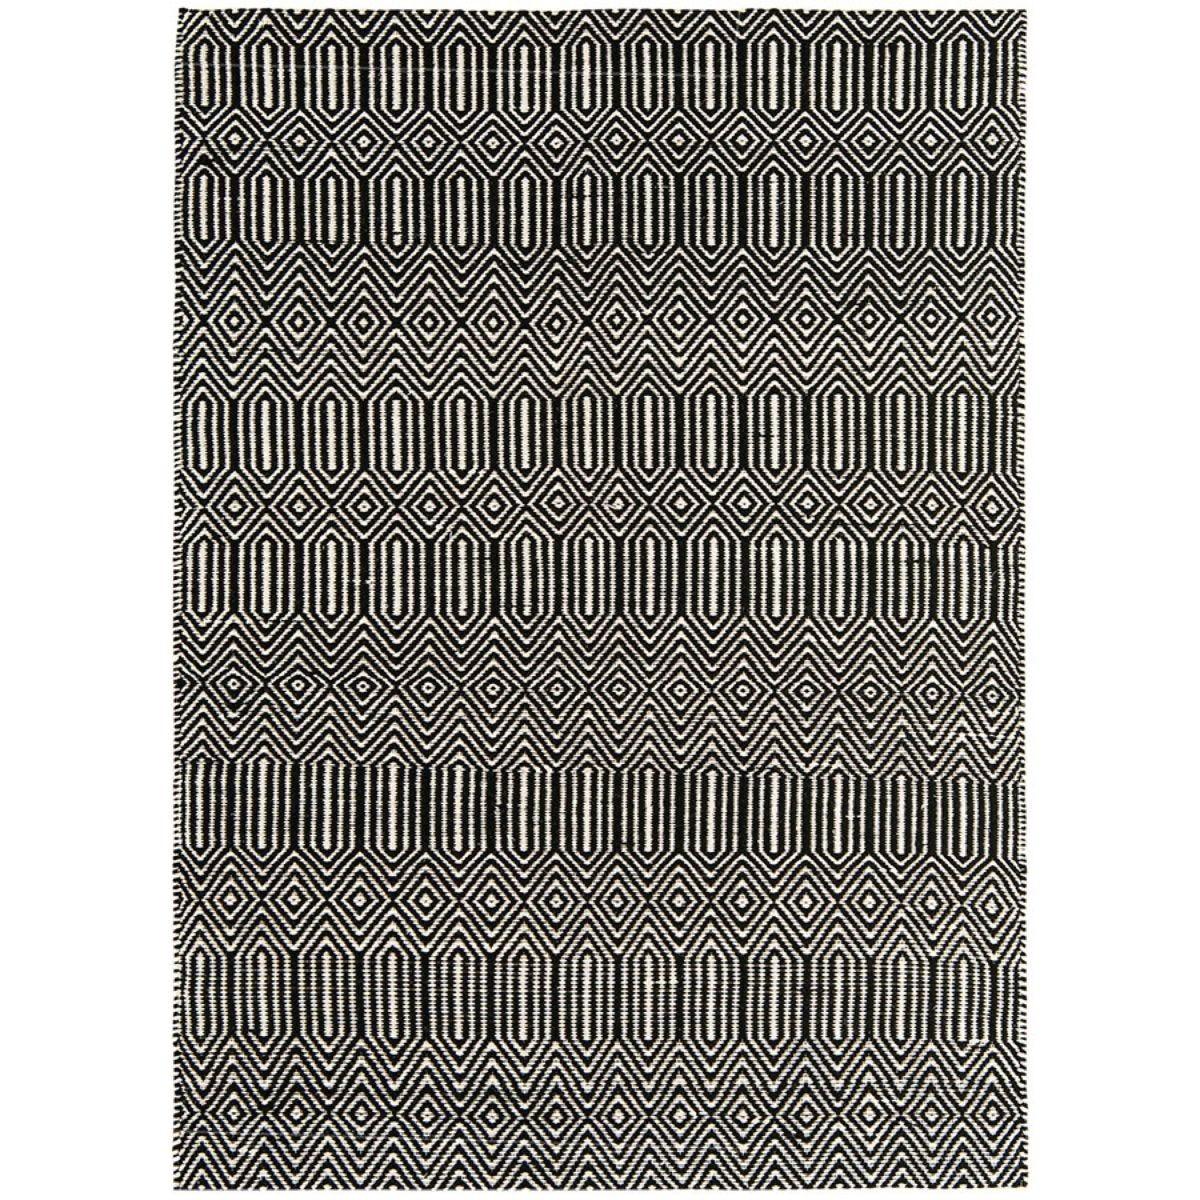 Asiatic Sloan Rug, 66 x 200cm - Black